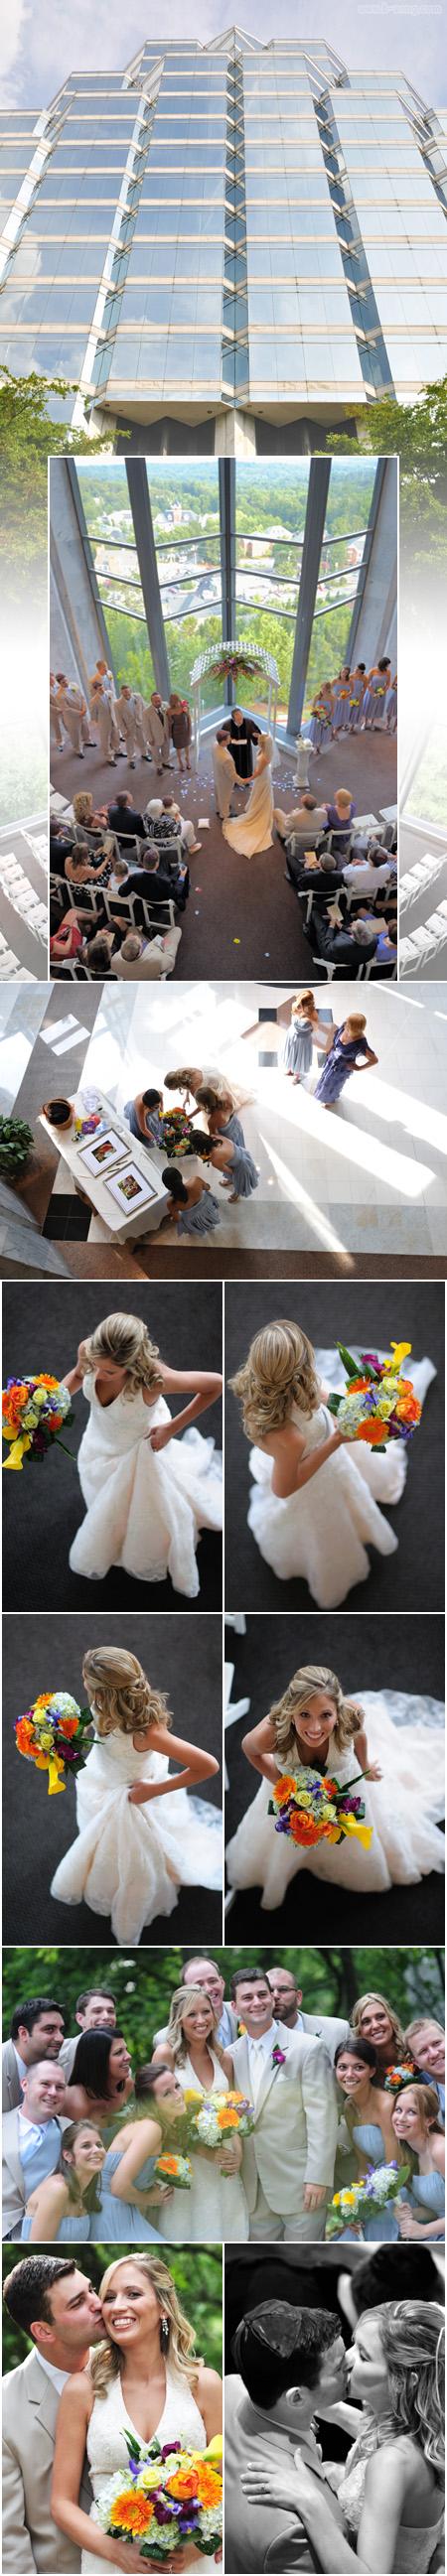 w_bvong_pix_vinings_club_wedding_2a